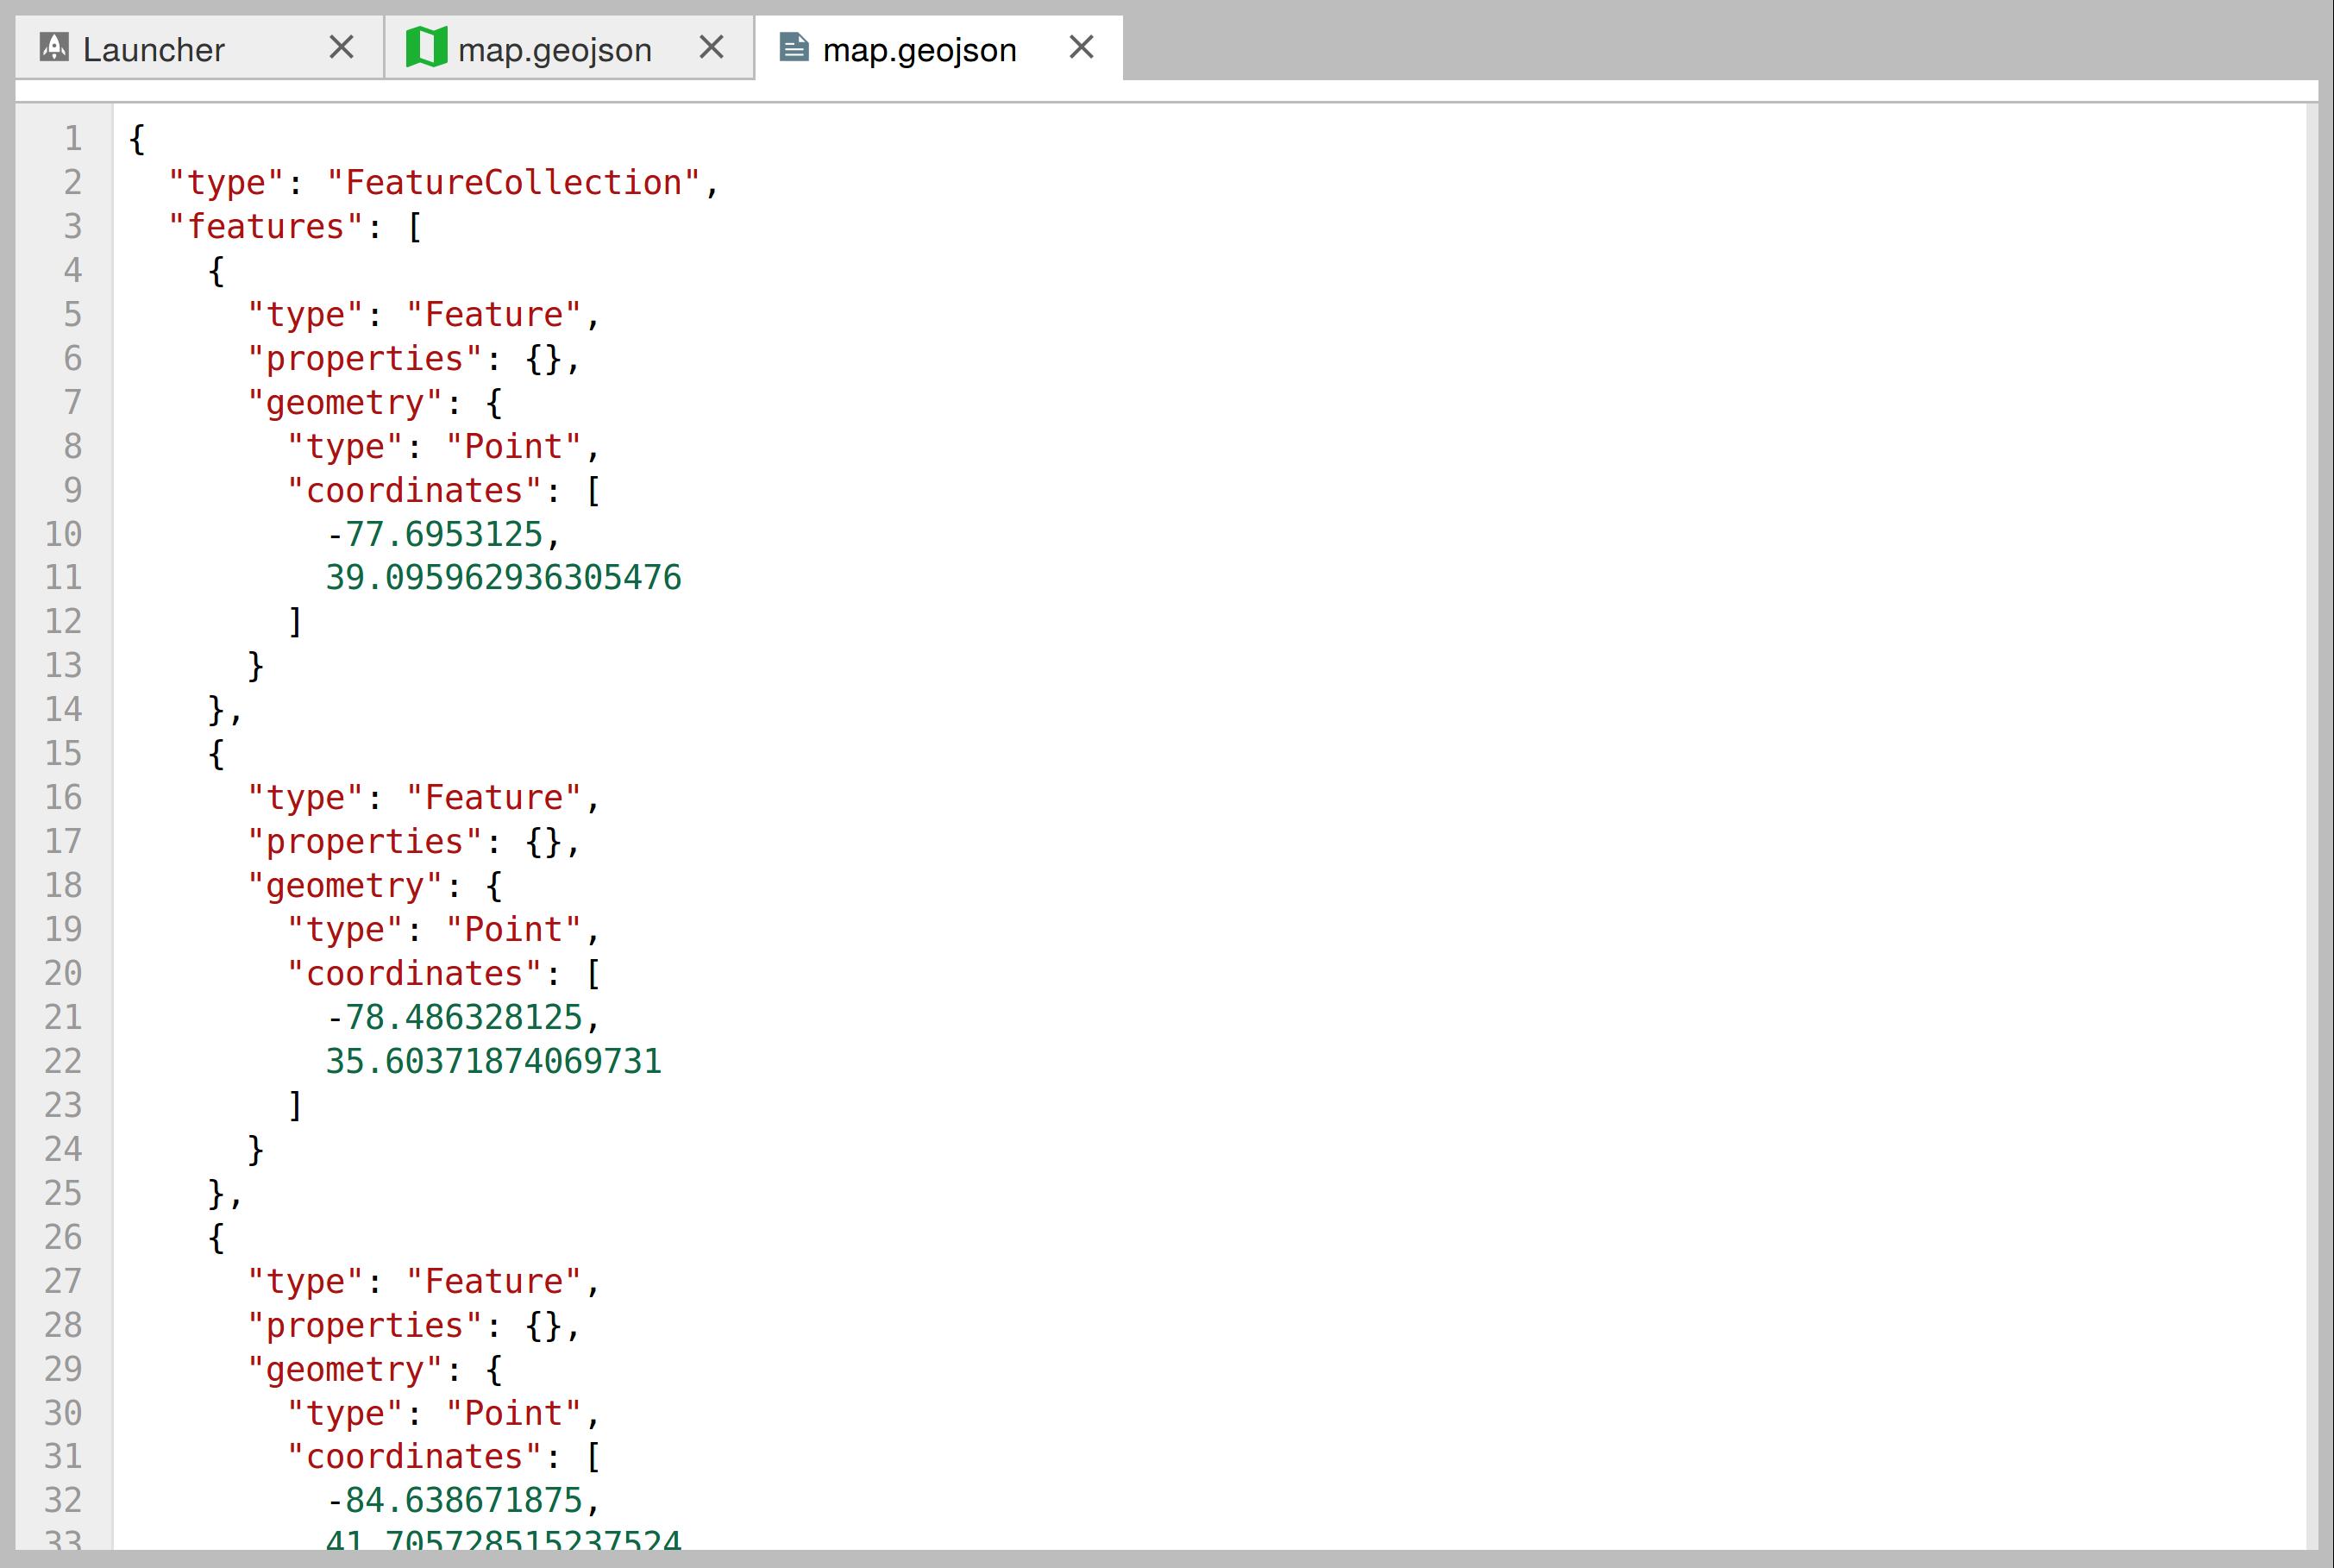 Editing a GeoJSON file